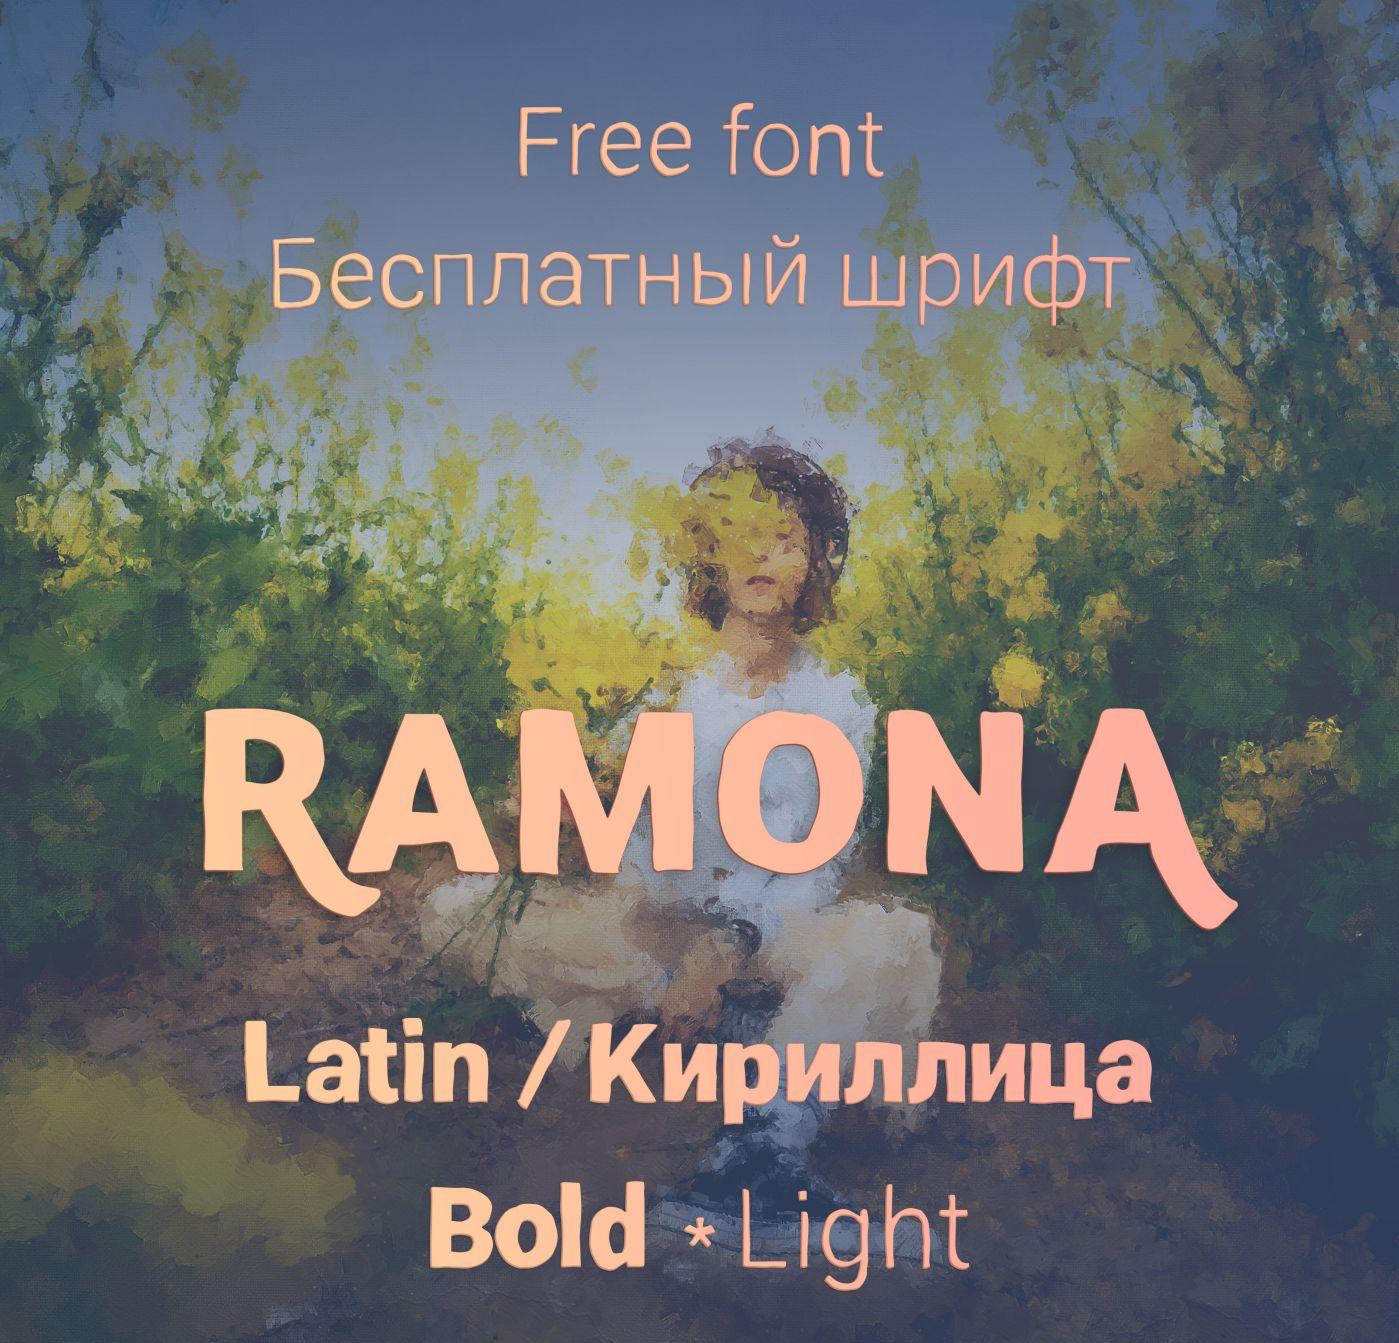 Шрифт Ramona Cyrillic